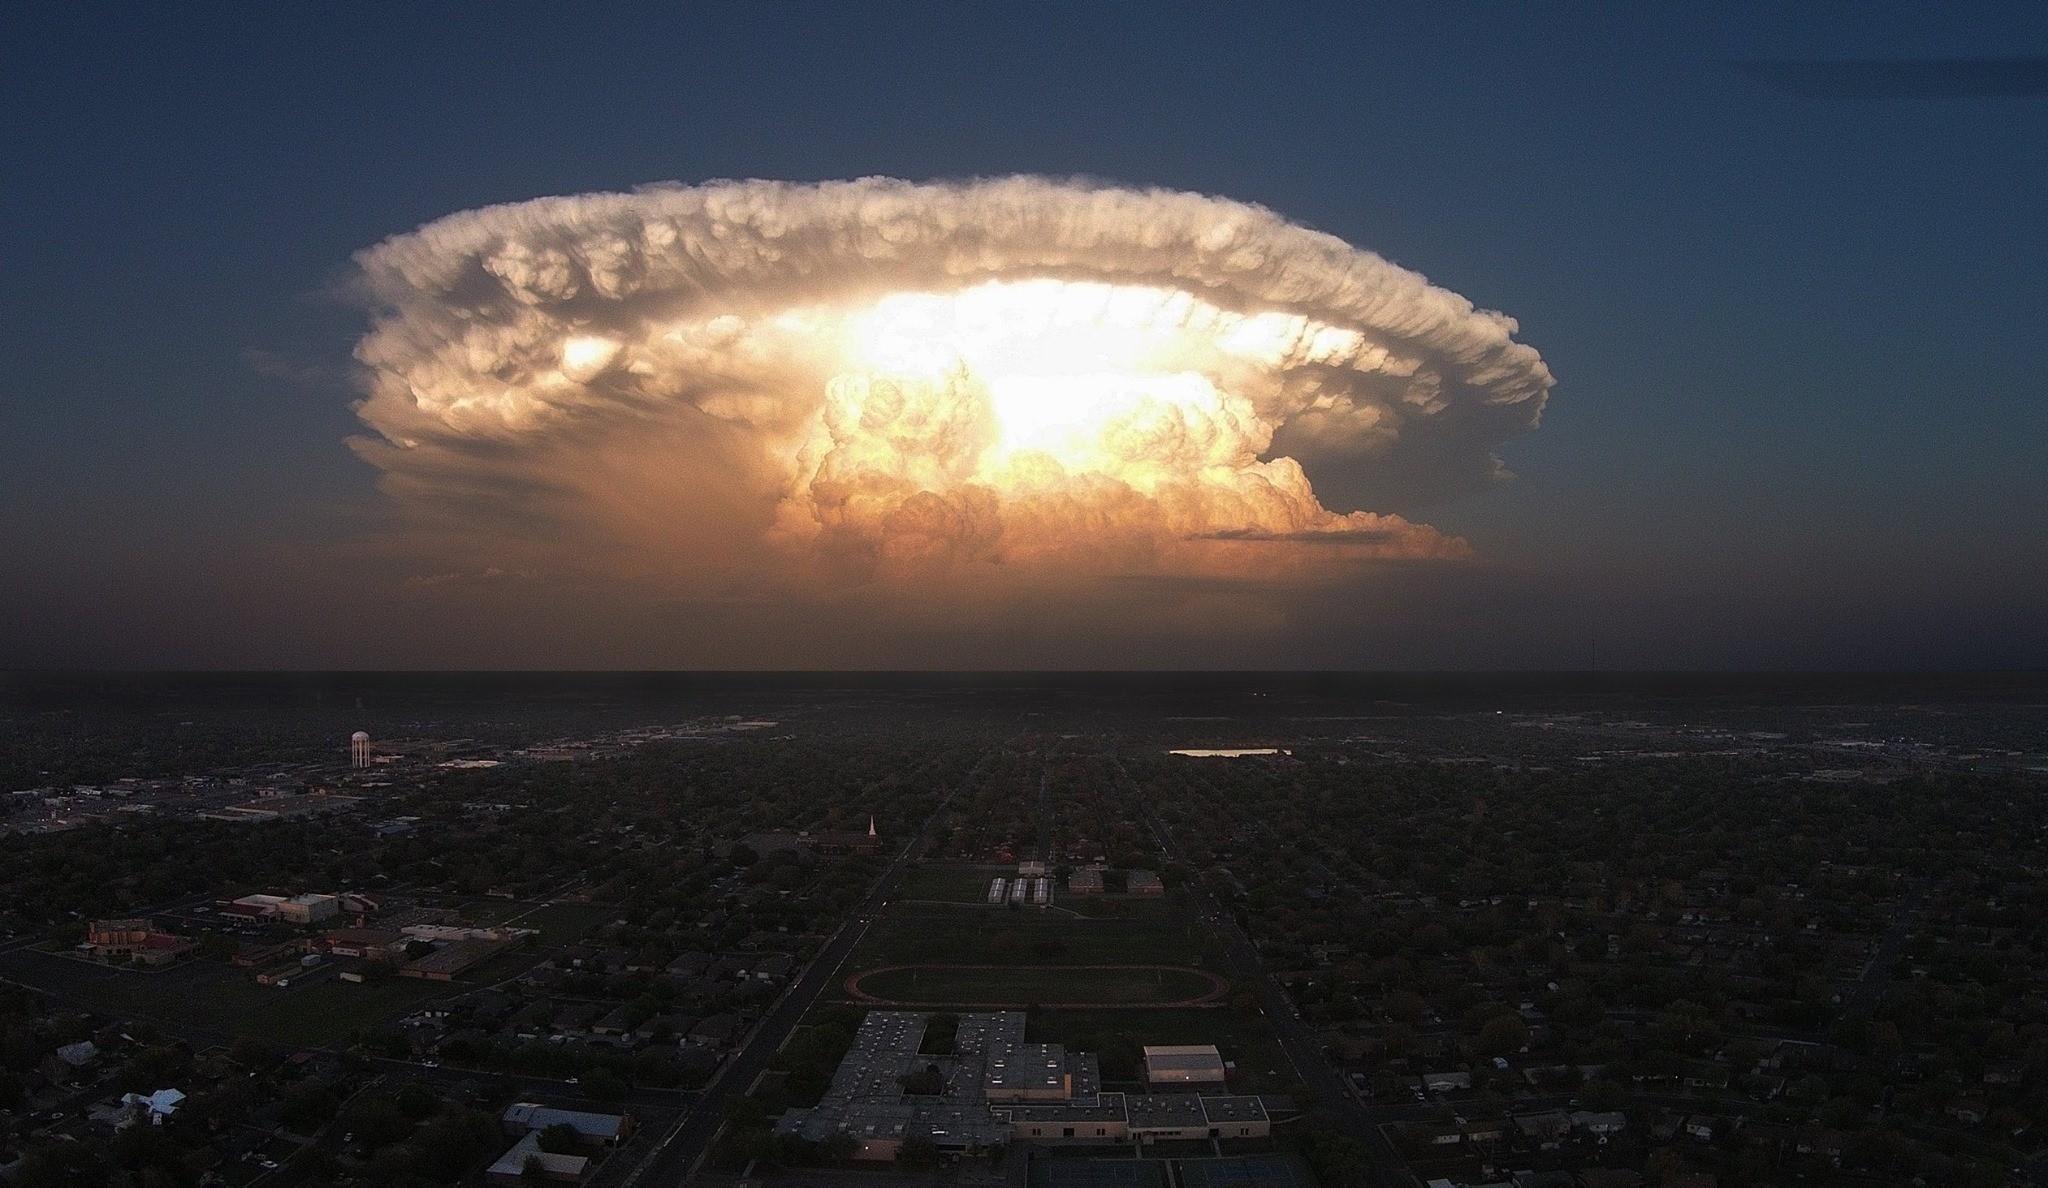 Supercell Nature Storm Clouds Texas Cityscape Nature Lights Landscape Wallpaper Resolution 2048x1188 Id 204372 Wallha Com